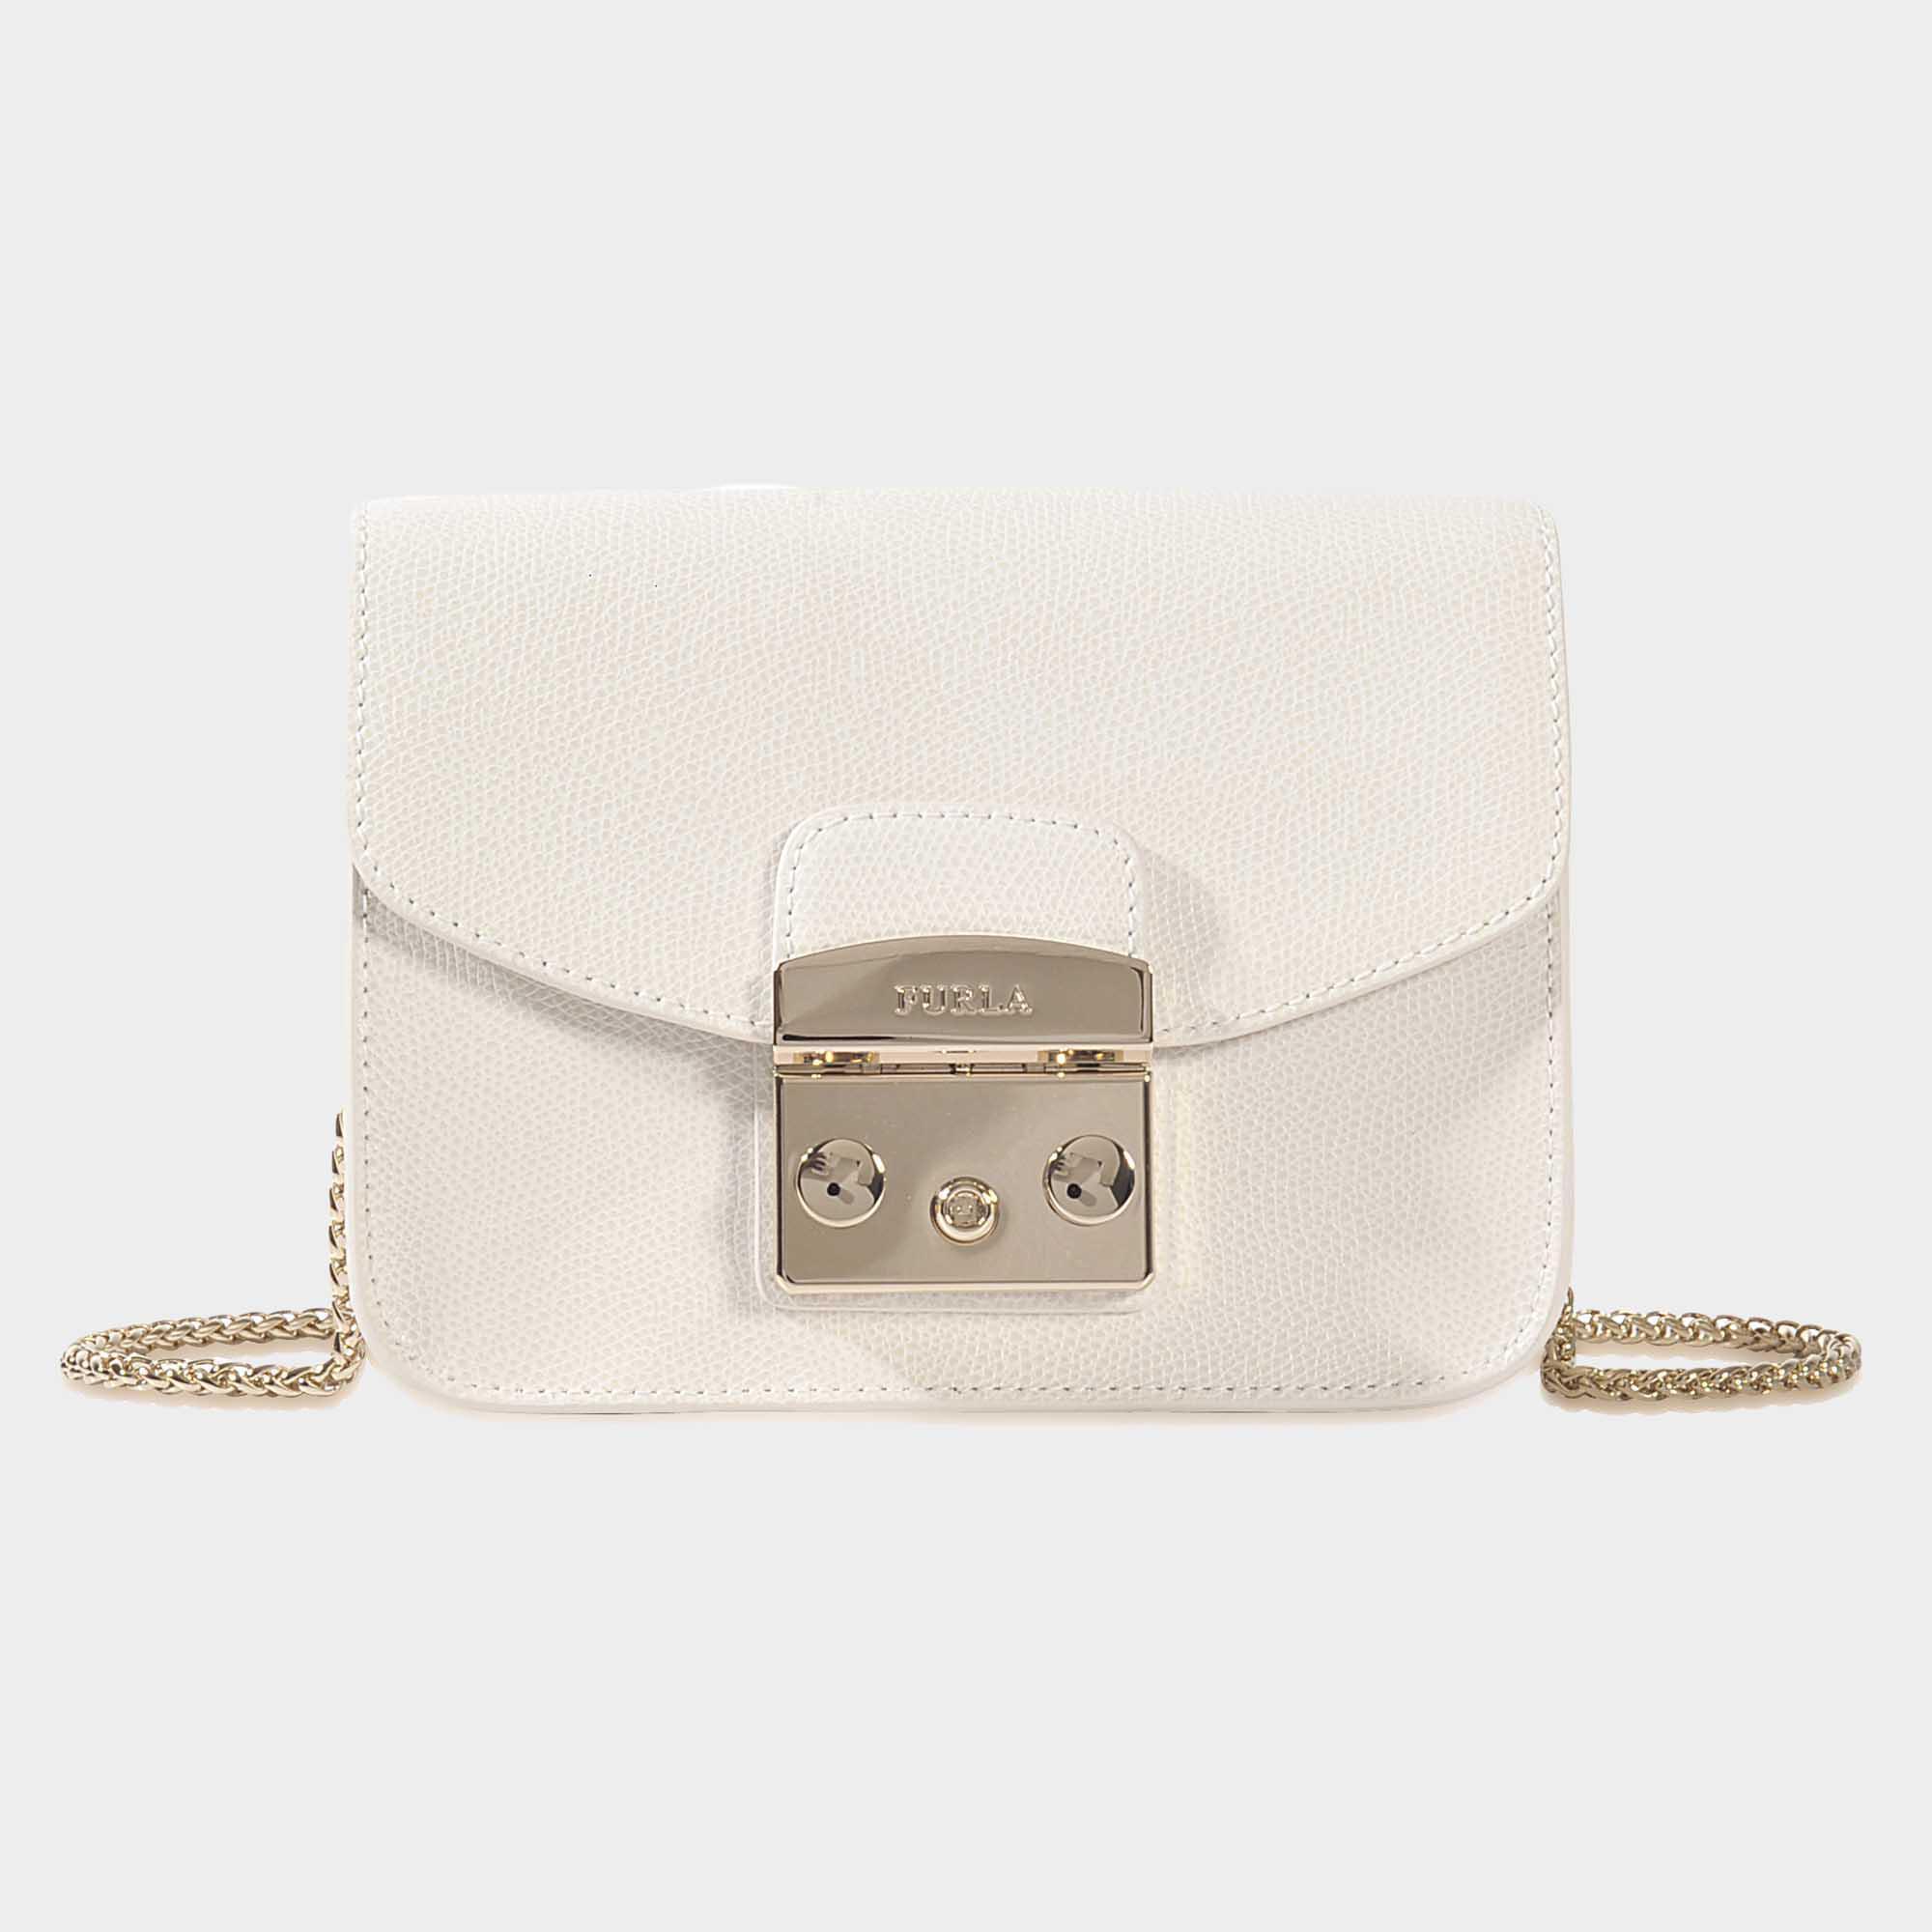 75a6aff053 Furla Metropolis Mini Crossbody Bag In Petalo Ares Leather in White ...